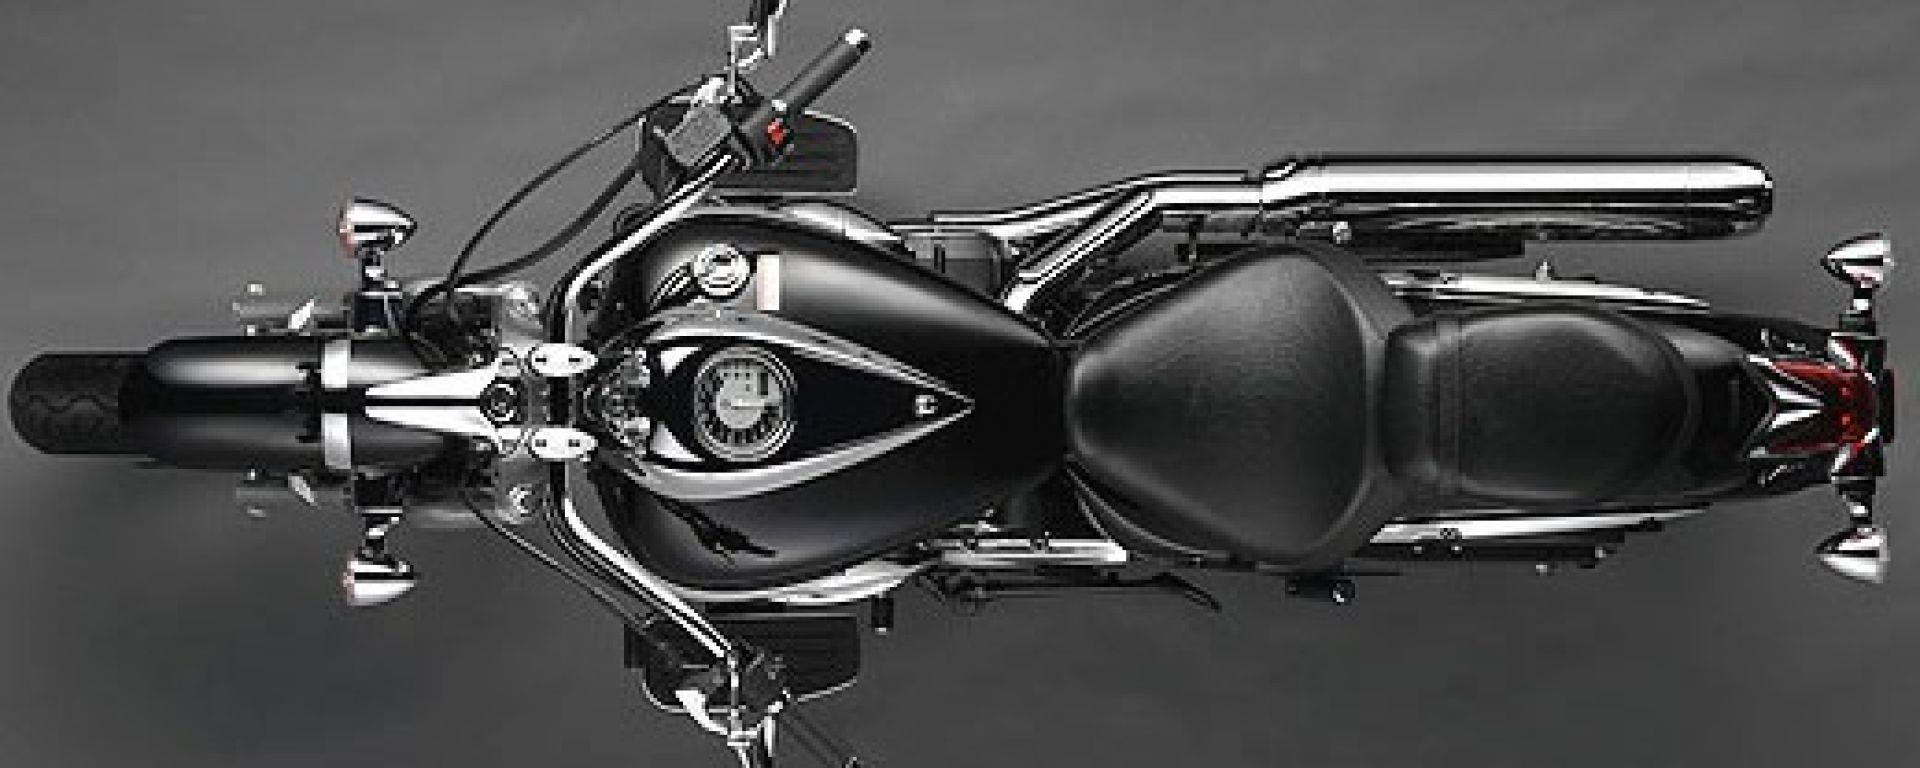 Yamaha Midnightstar 950